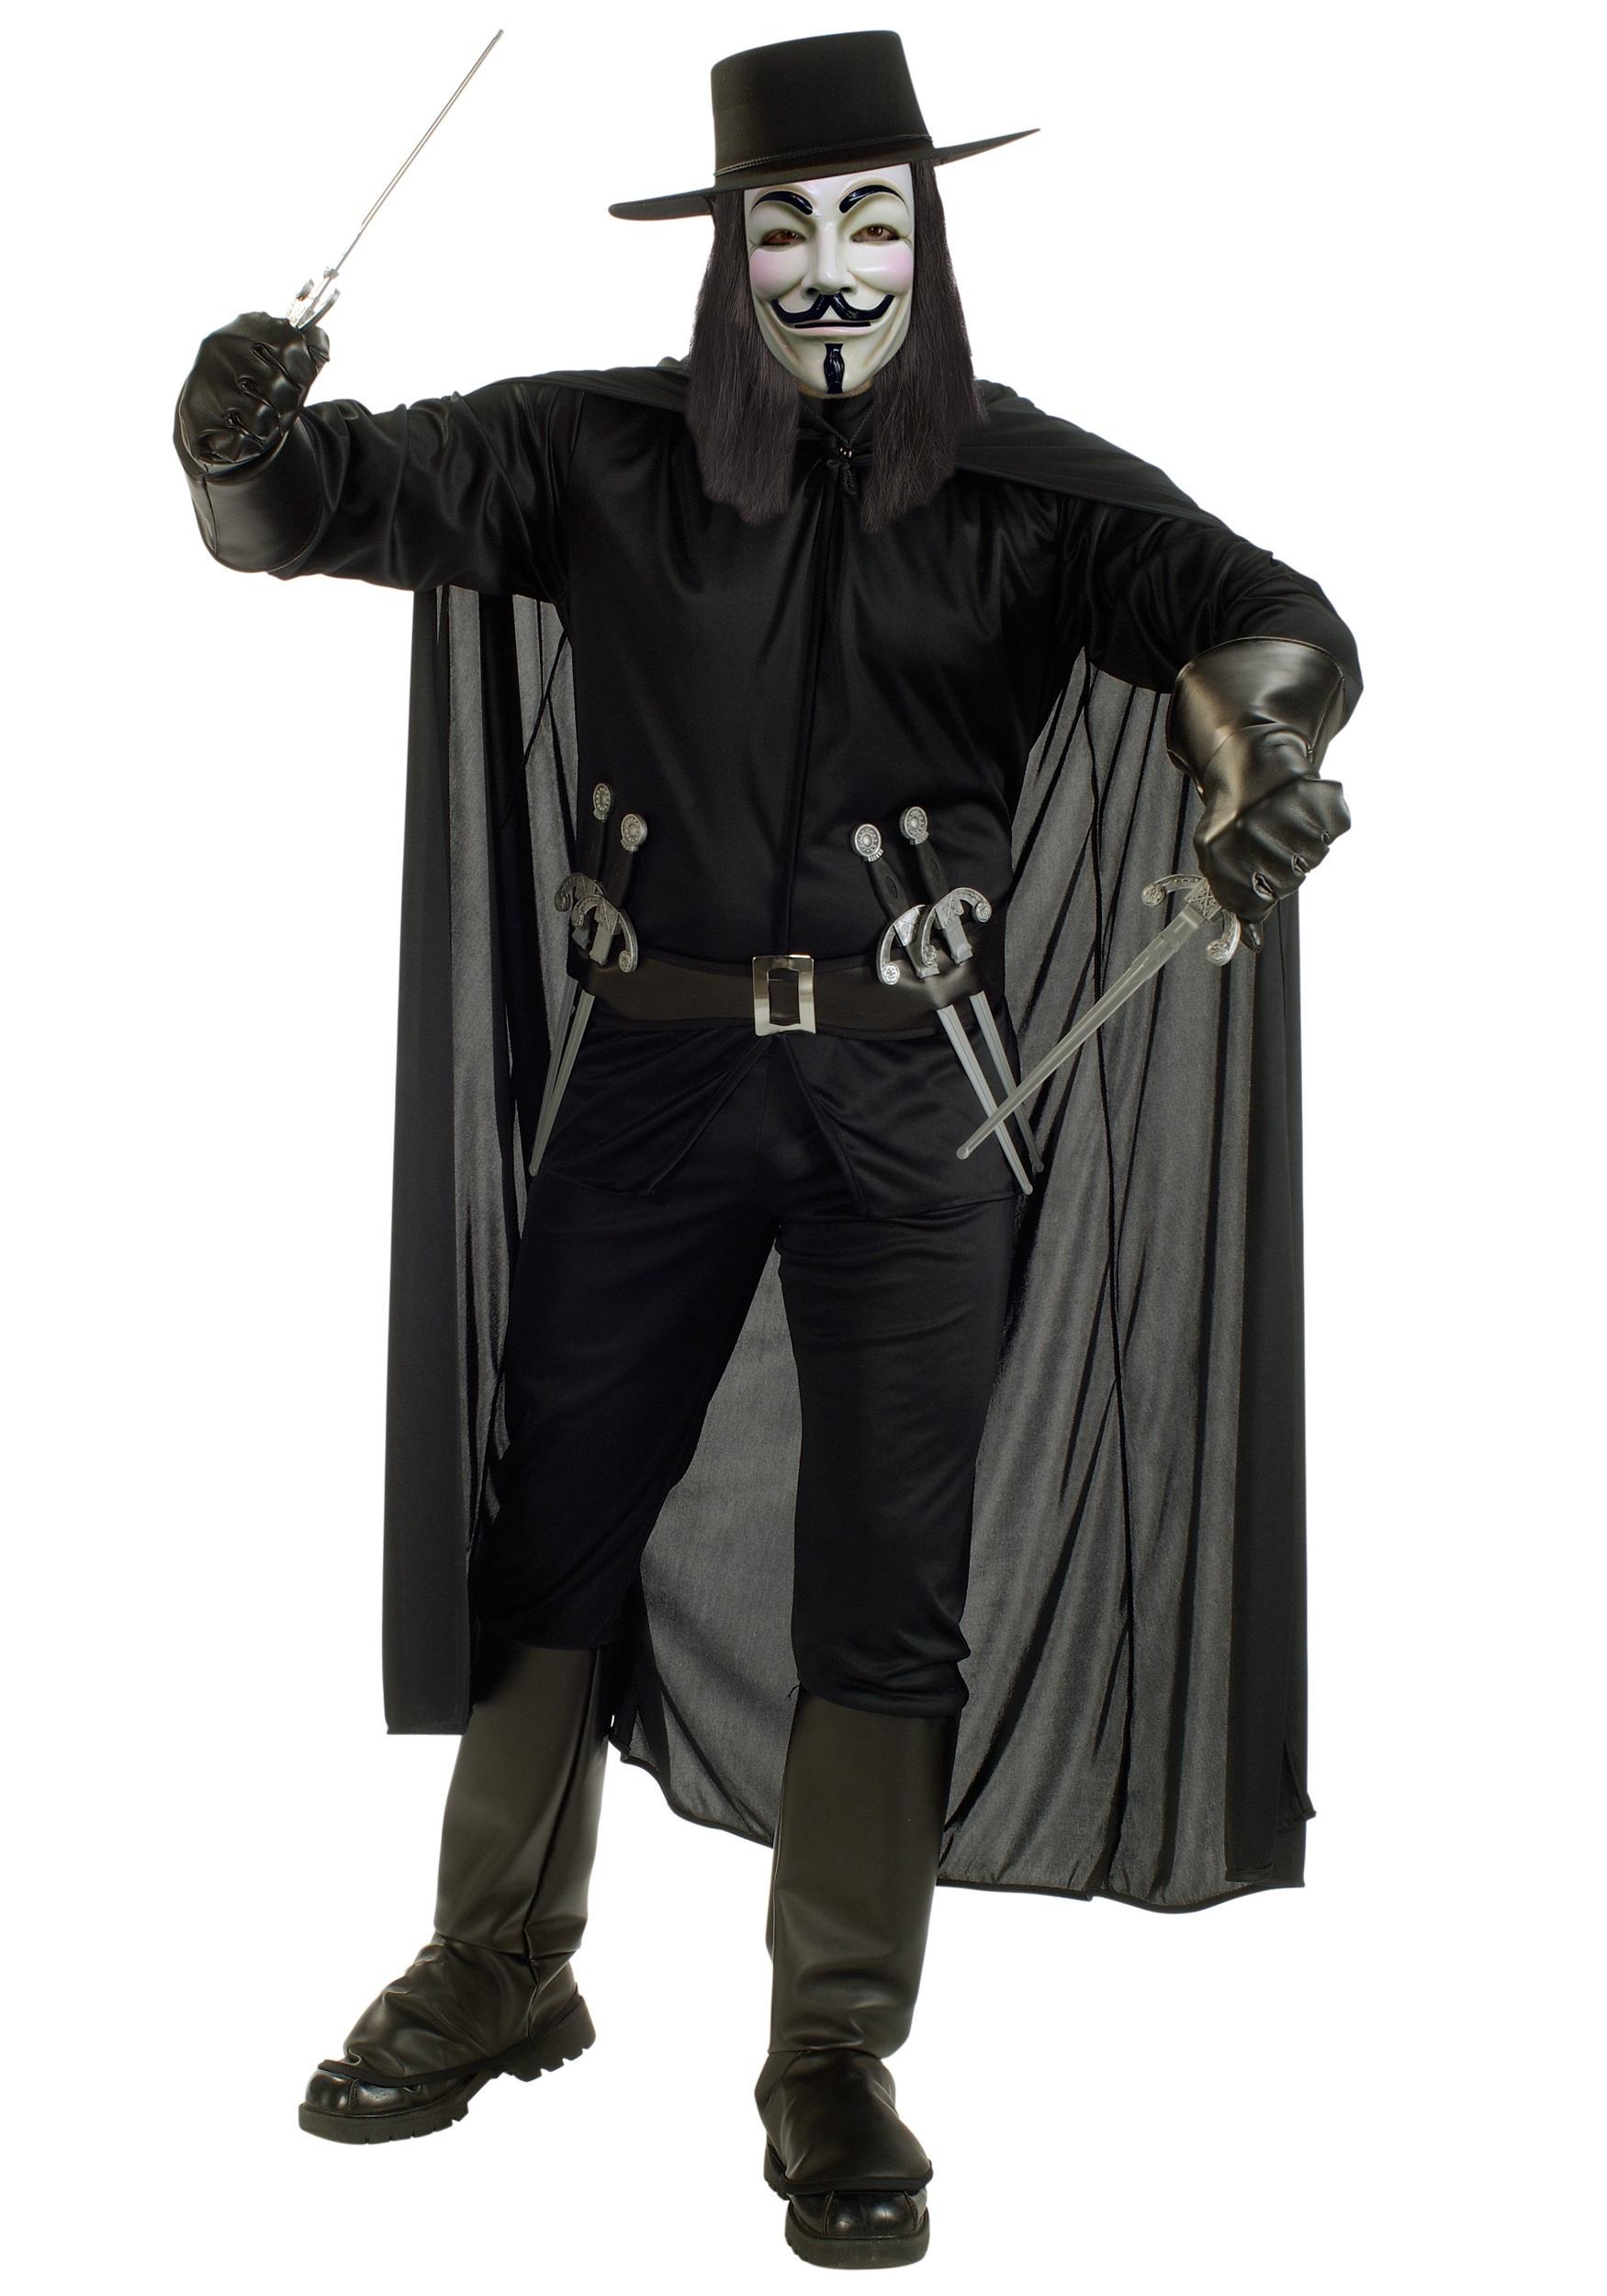 Adult V for Vendetta Costume Includes Shirt Pants w/ Boot Tops Belt w/6 Daggers Cape Mask Hat